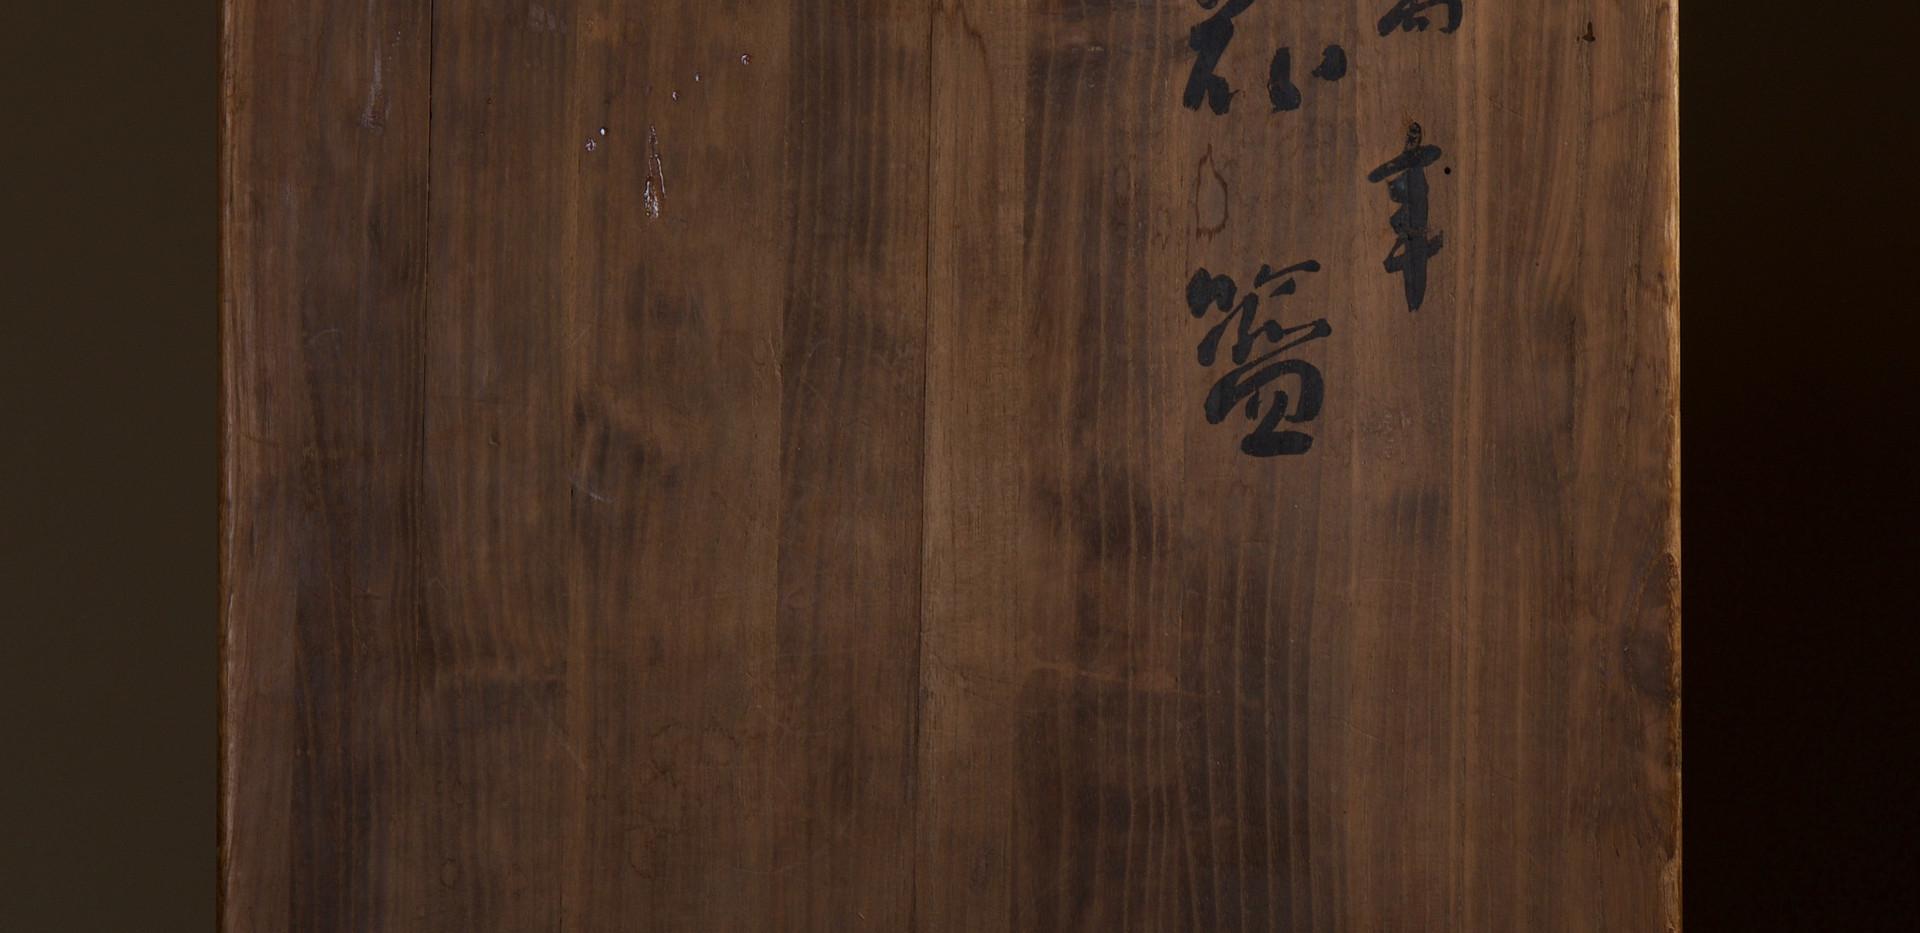 Bamboo basket Many Flowers by Tanabe Chikuunsai II 05.jpg